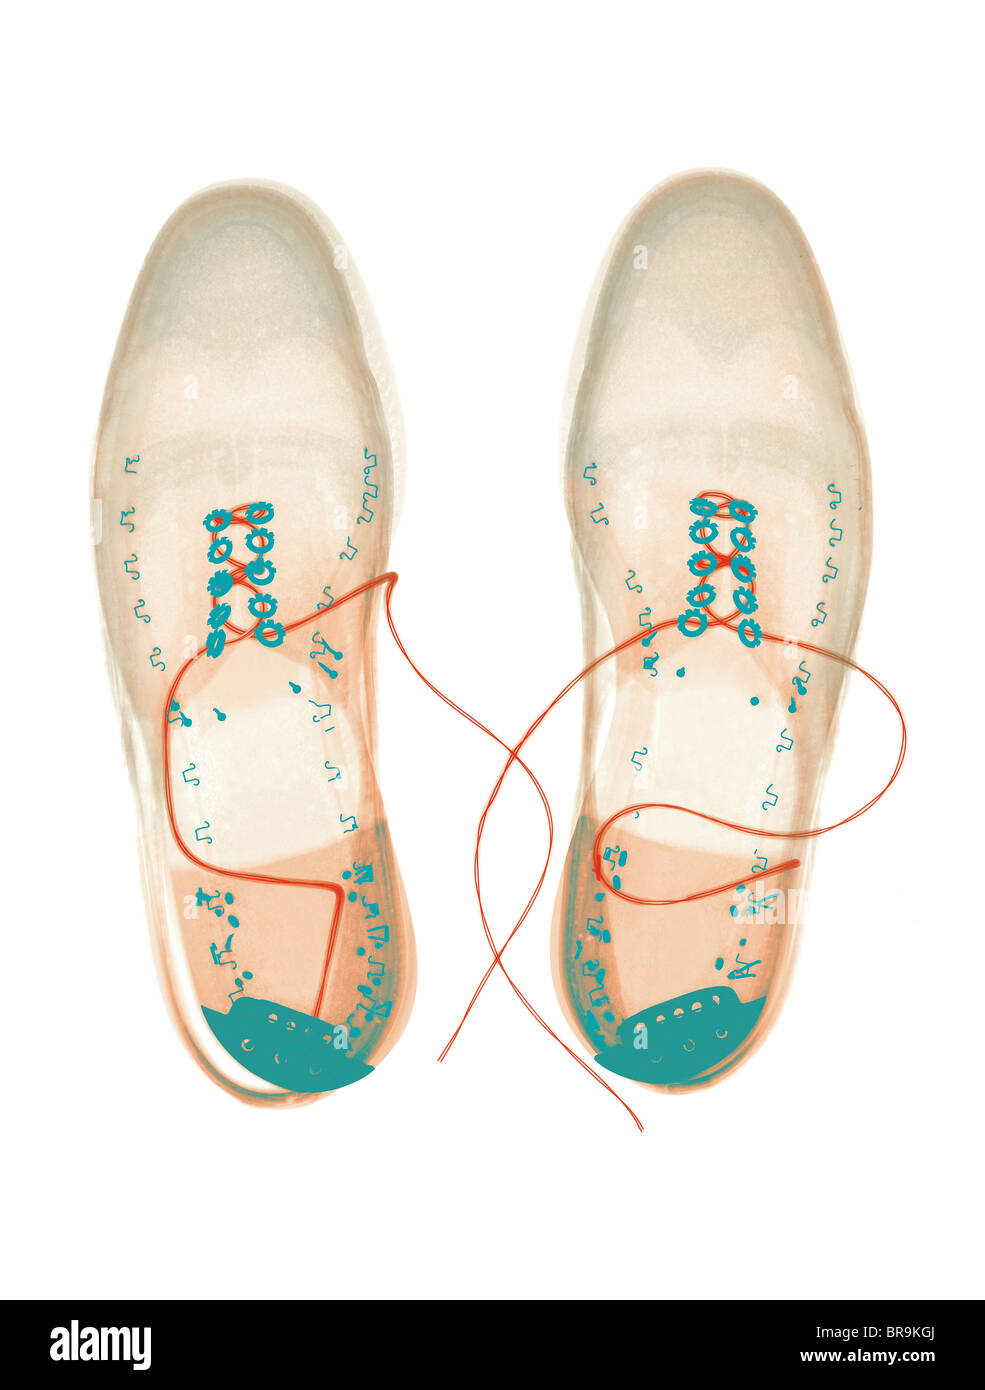 Xray image of shoes - Stock Image